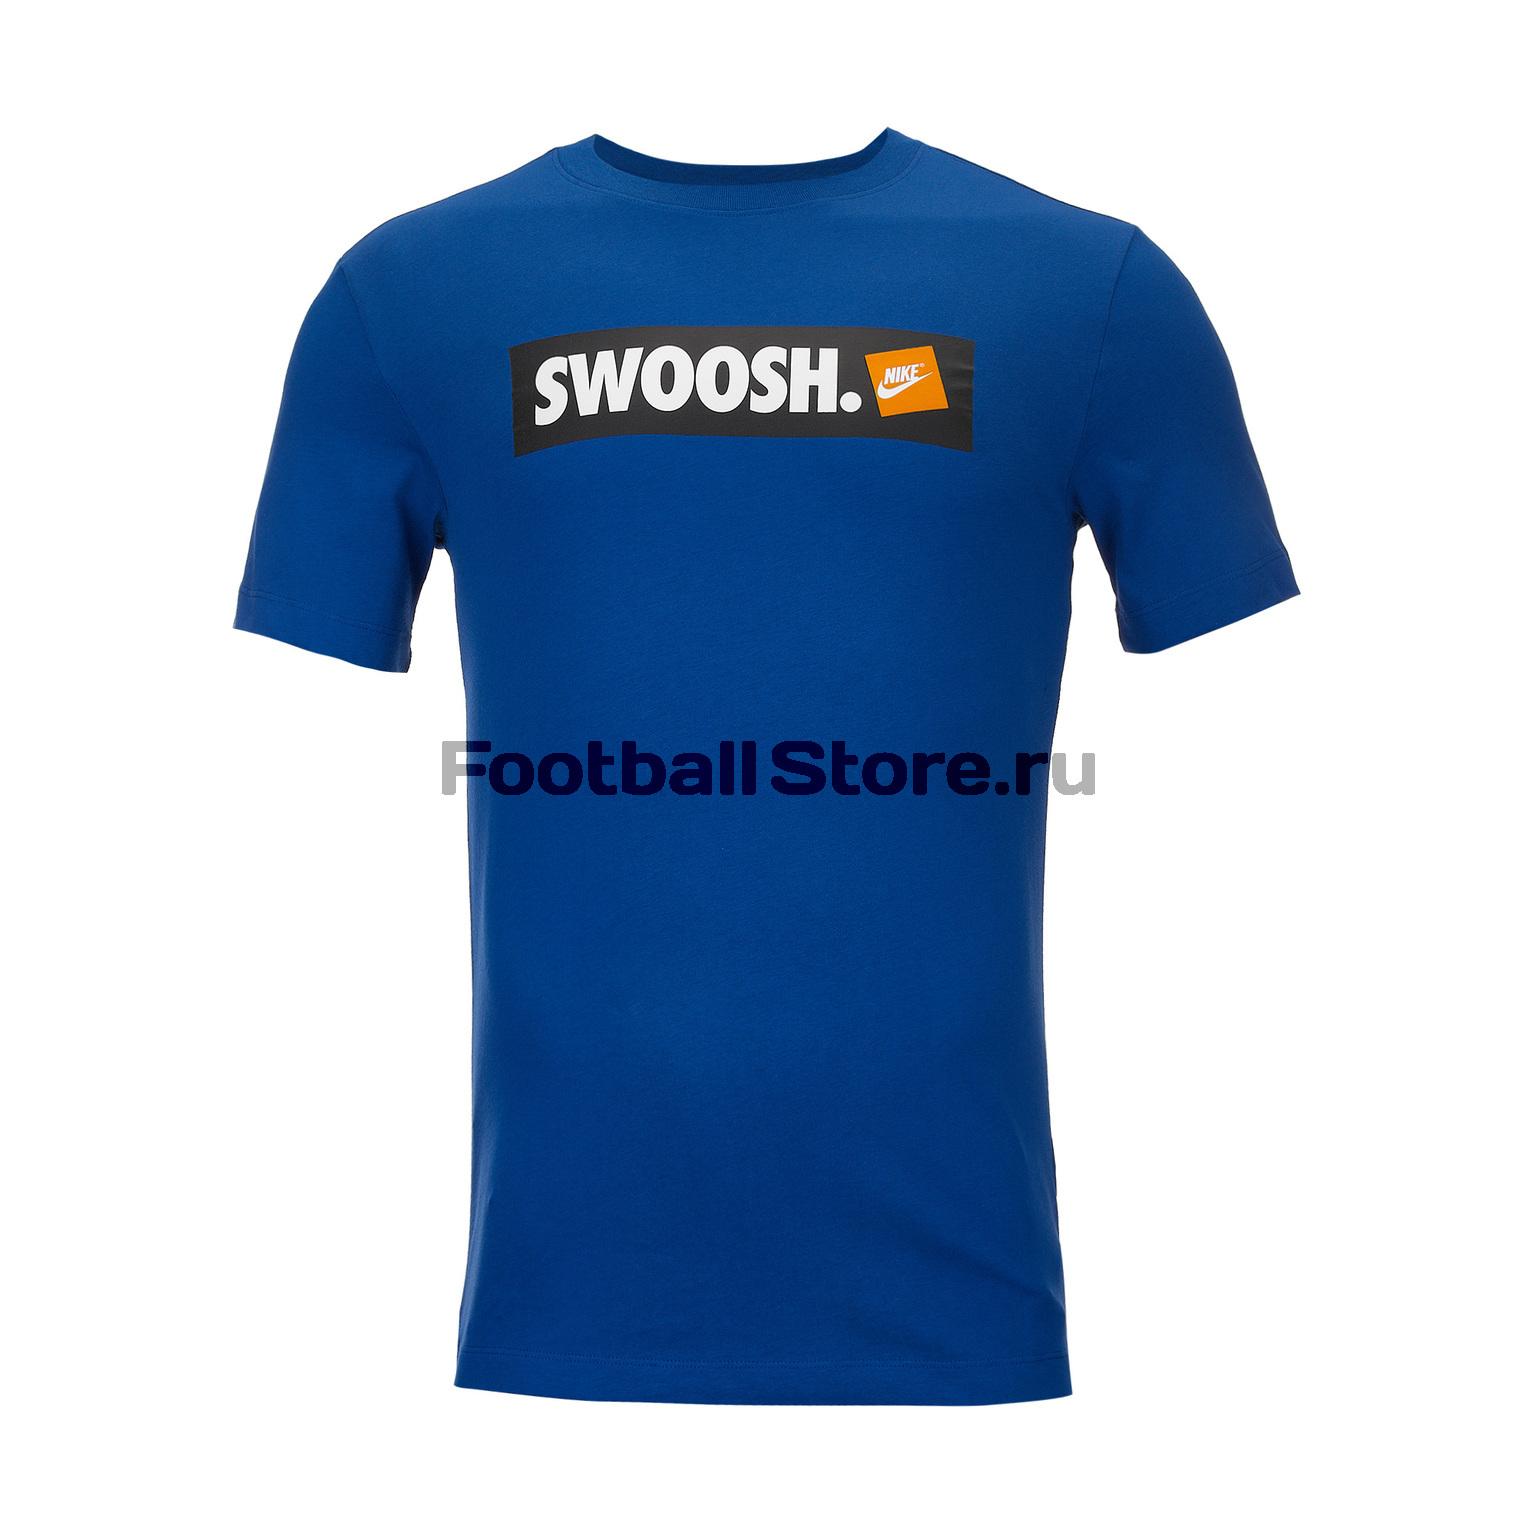 Футболка хлопковая Nike Tee Swoosh AR5027-438 футболка хлопковая nike tee club19 ss aj1504 451